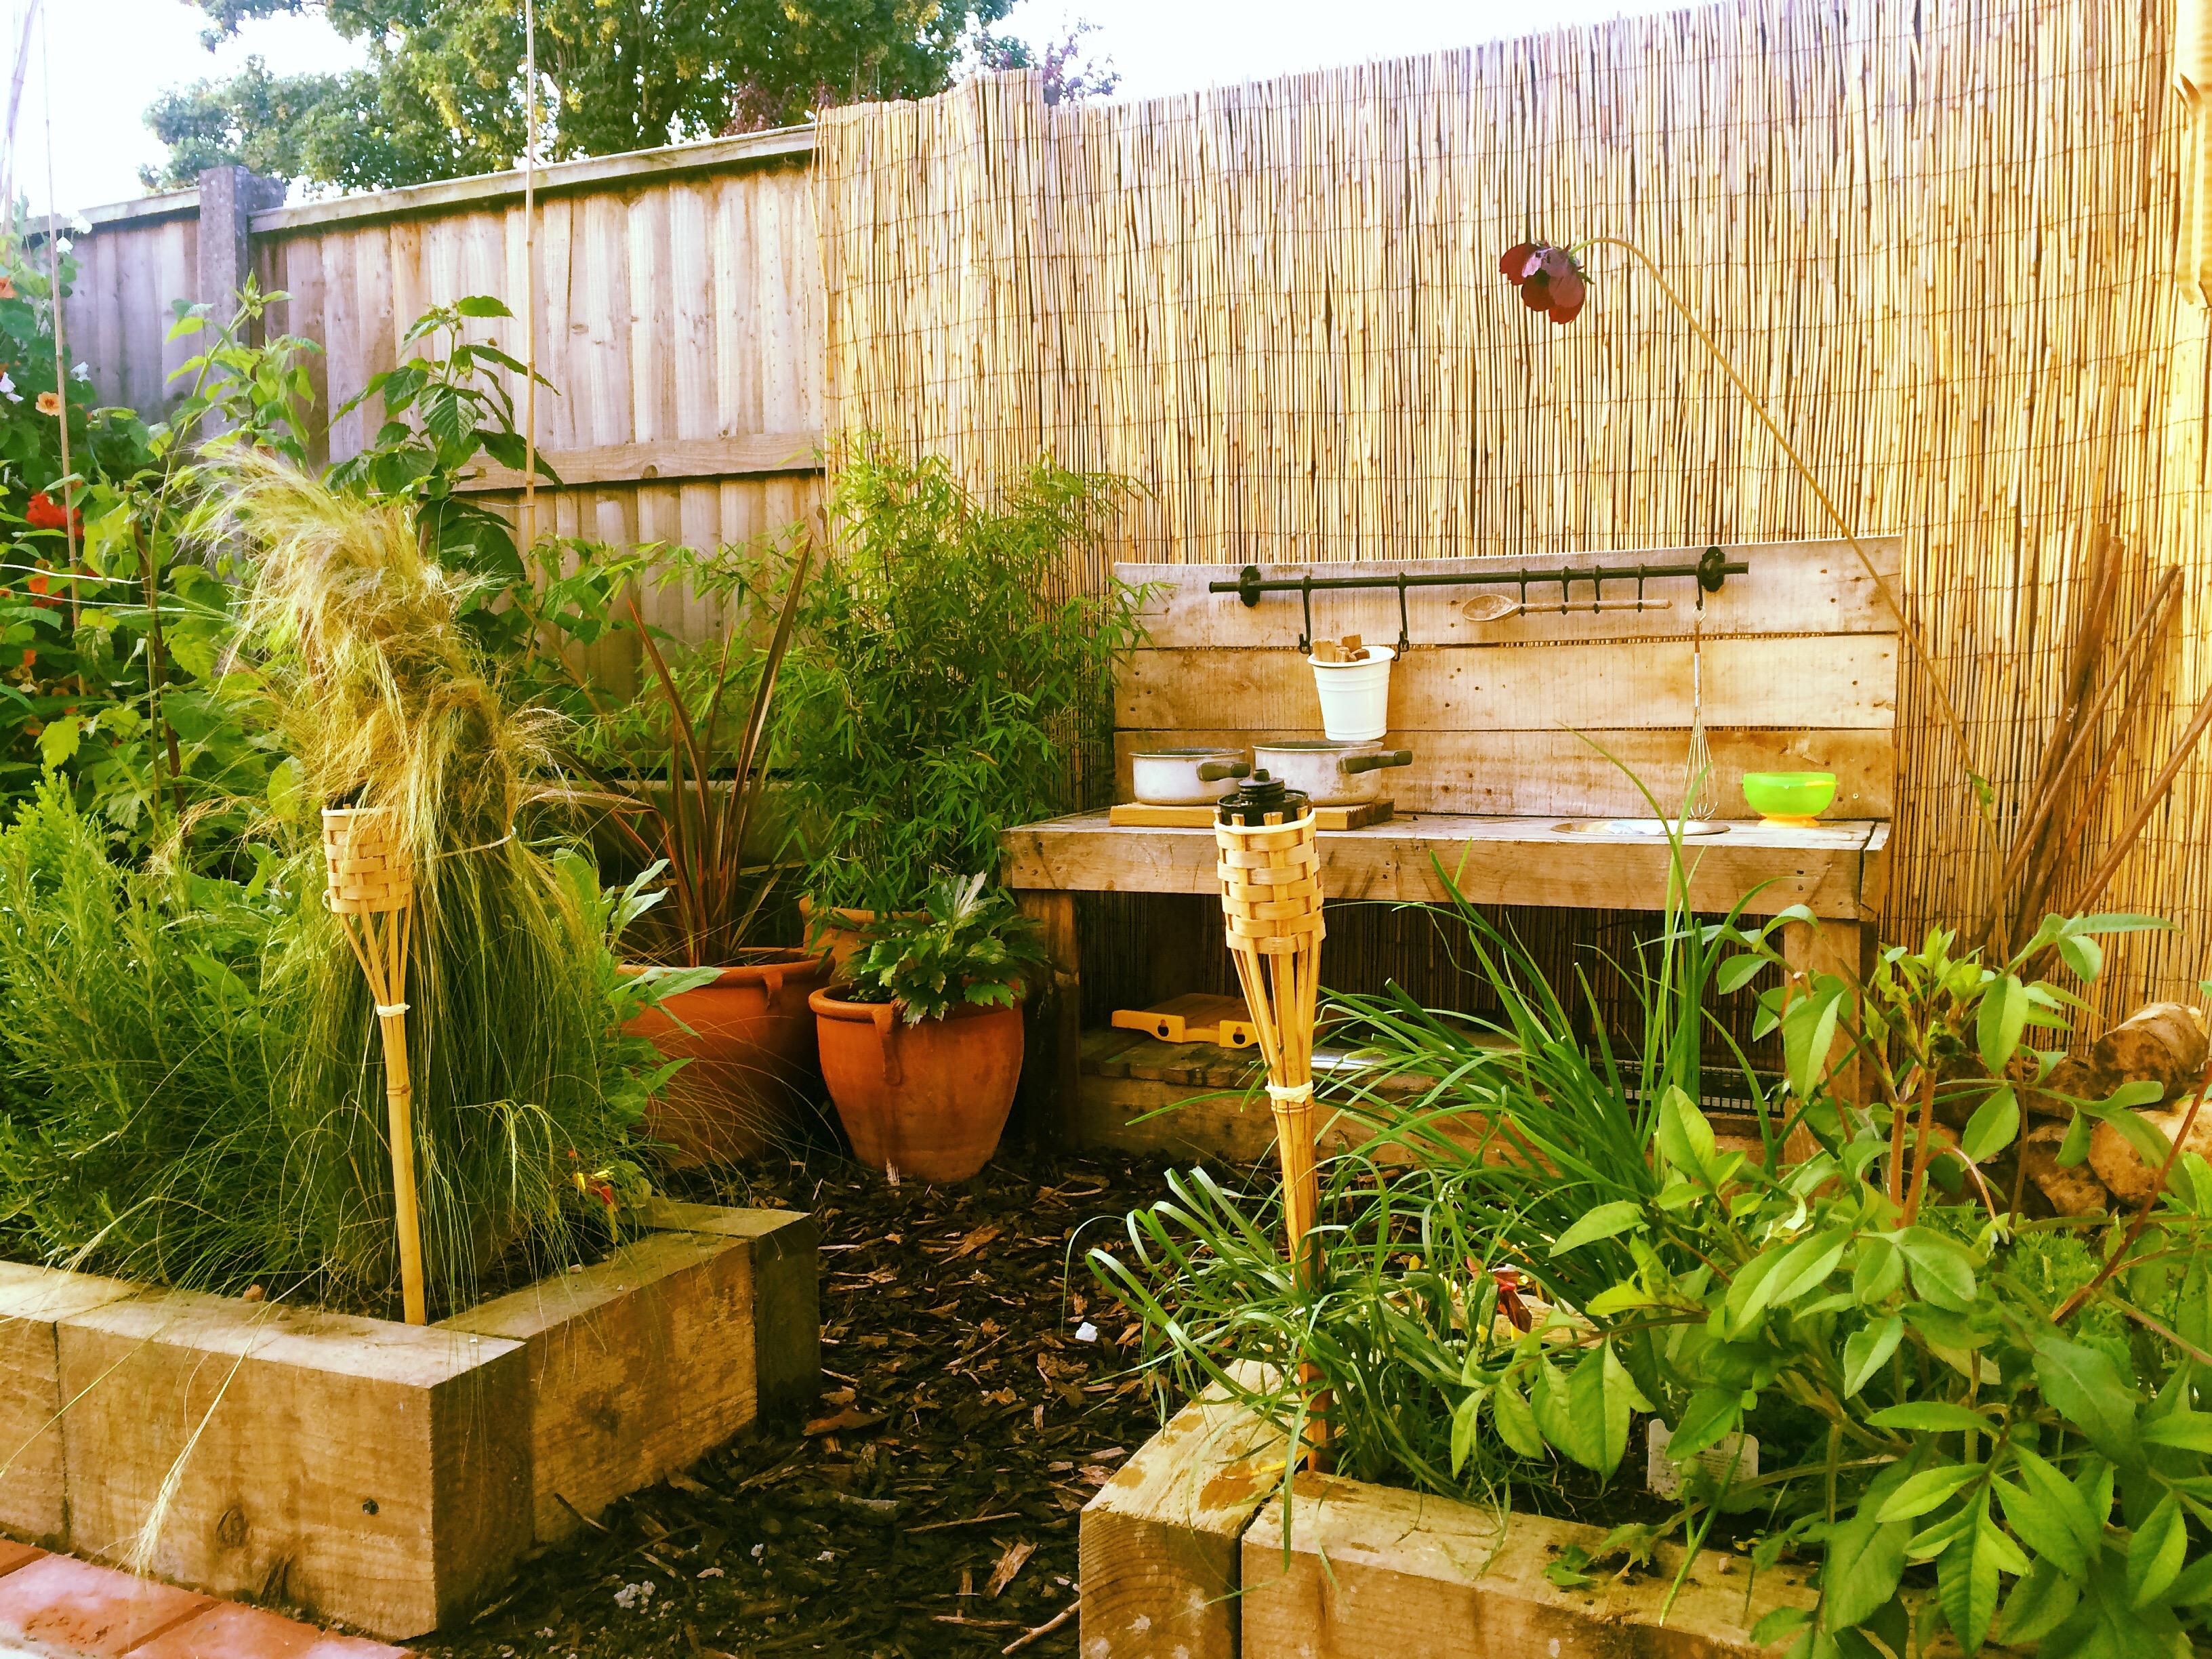 Jungle themed sensory garden